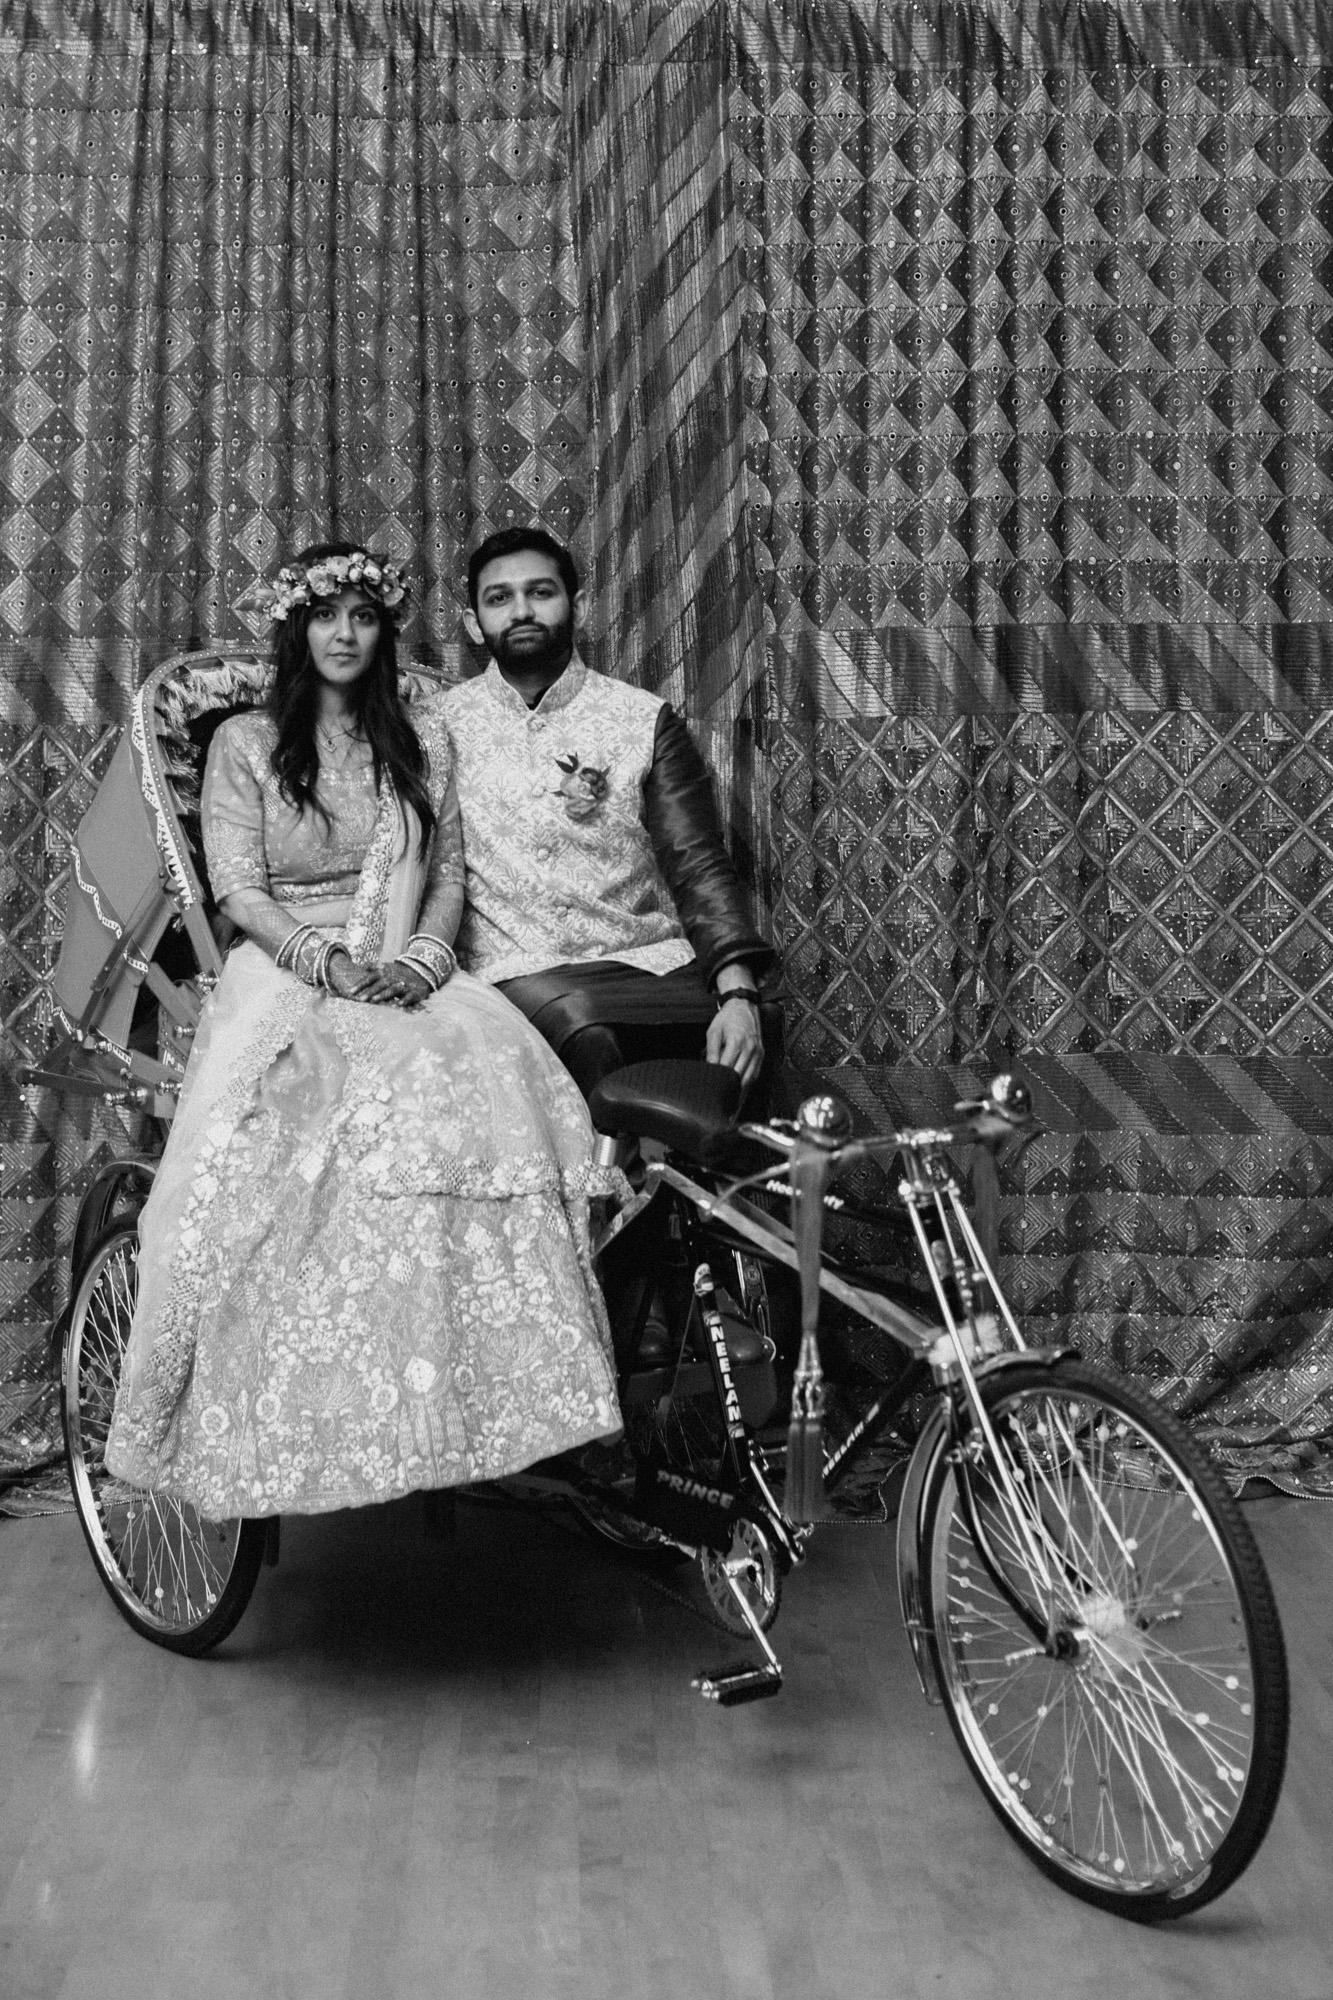 anu_maneesh_alec_vanderboom_Indian_wedding_photography-0040.jpg